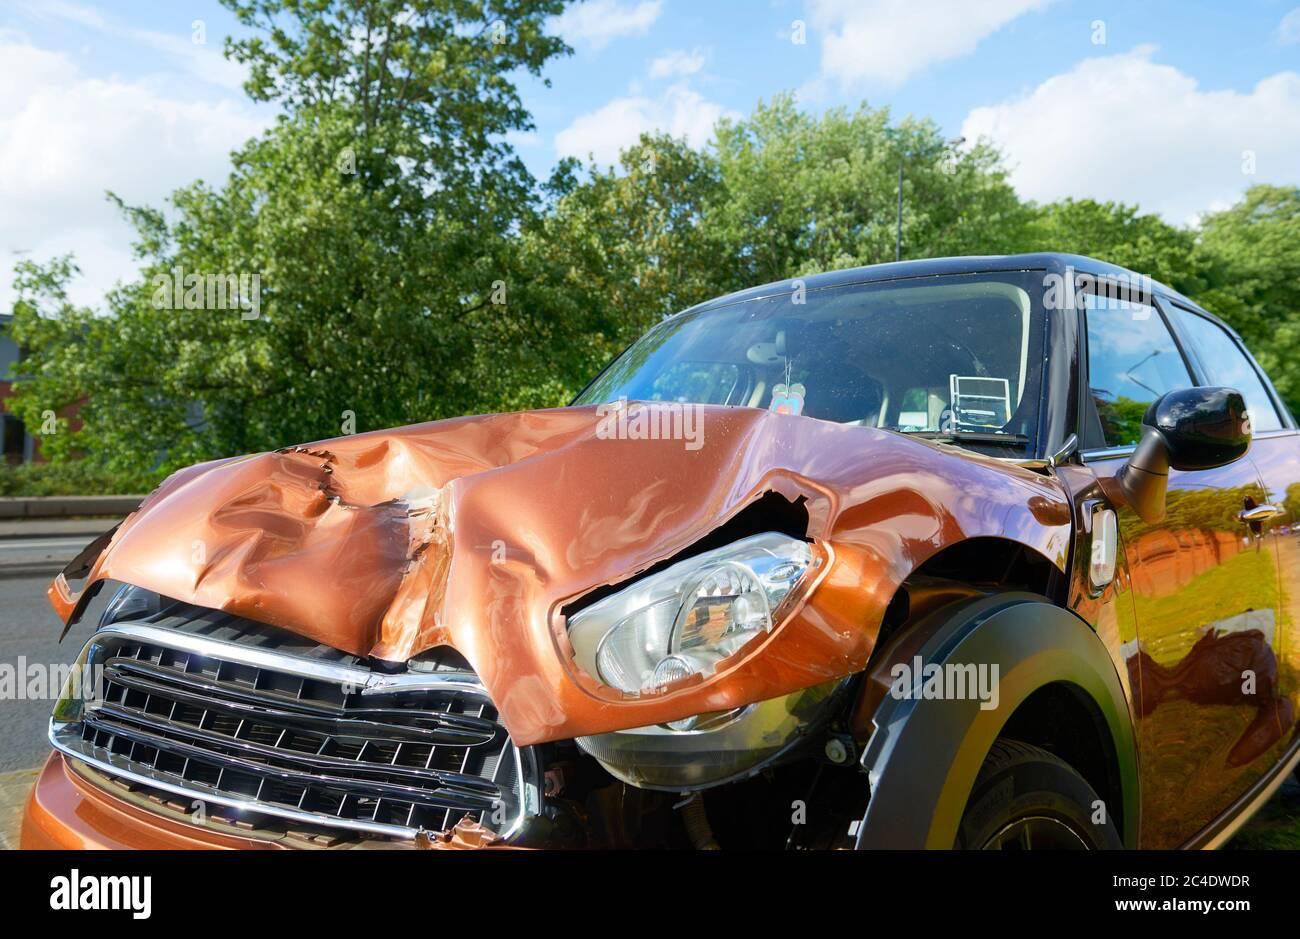 Car Crash Hit and Run Drunk Driving Stock Photo